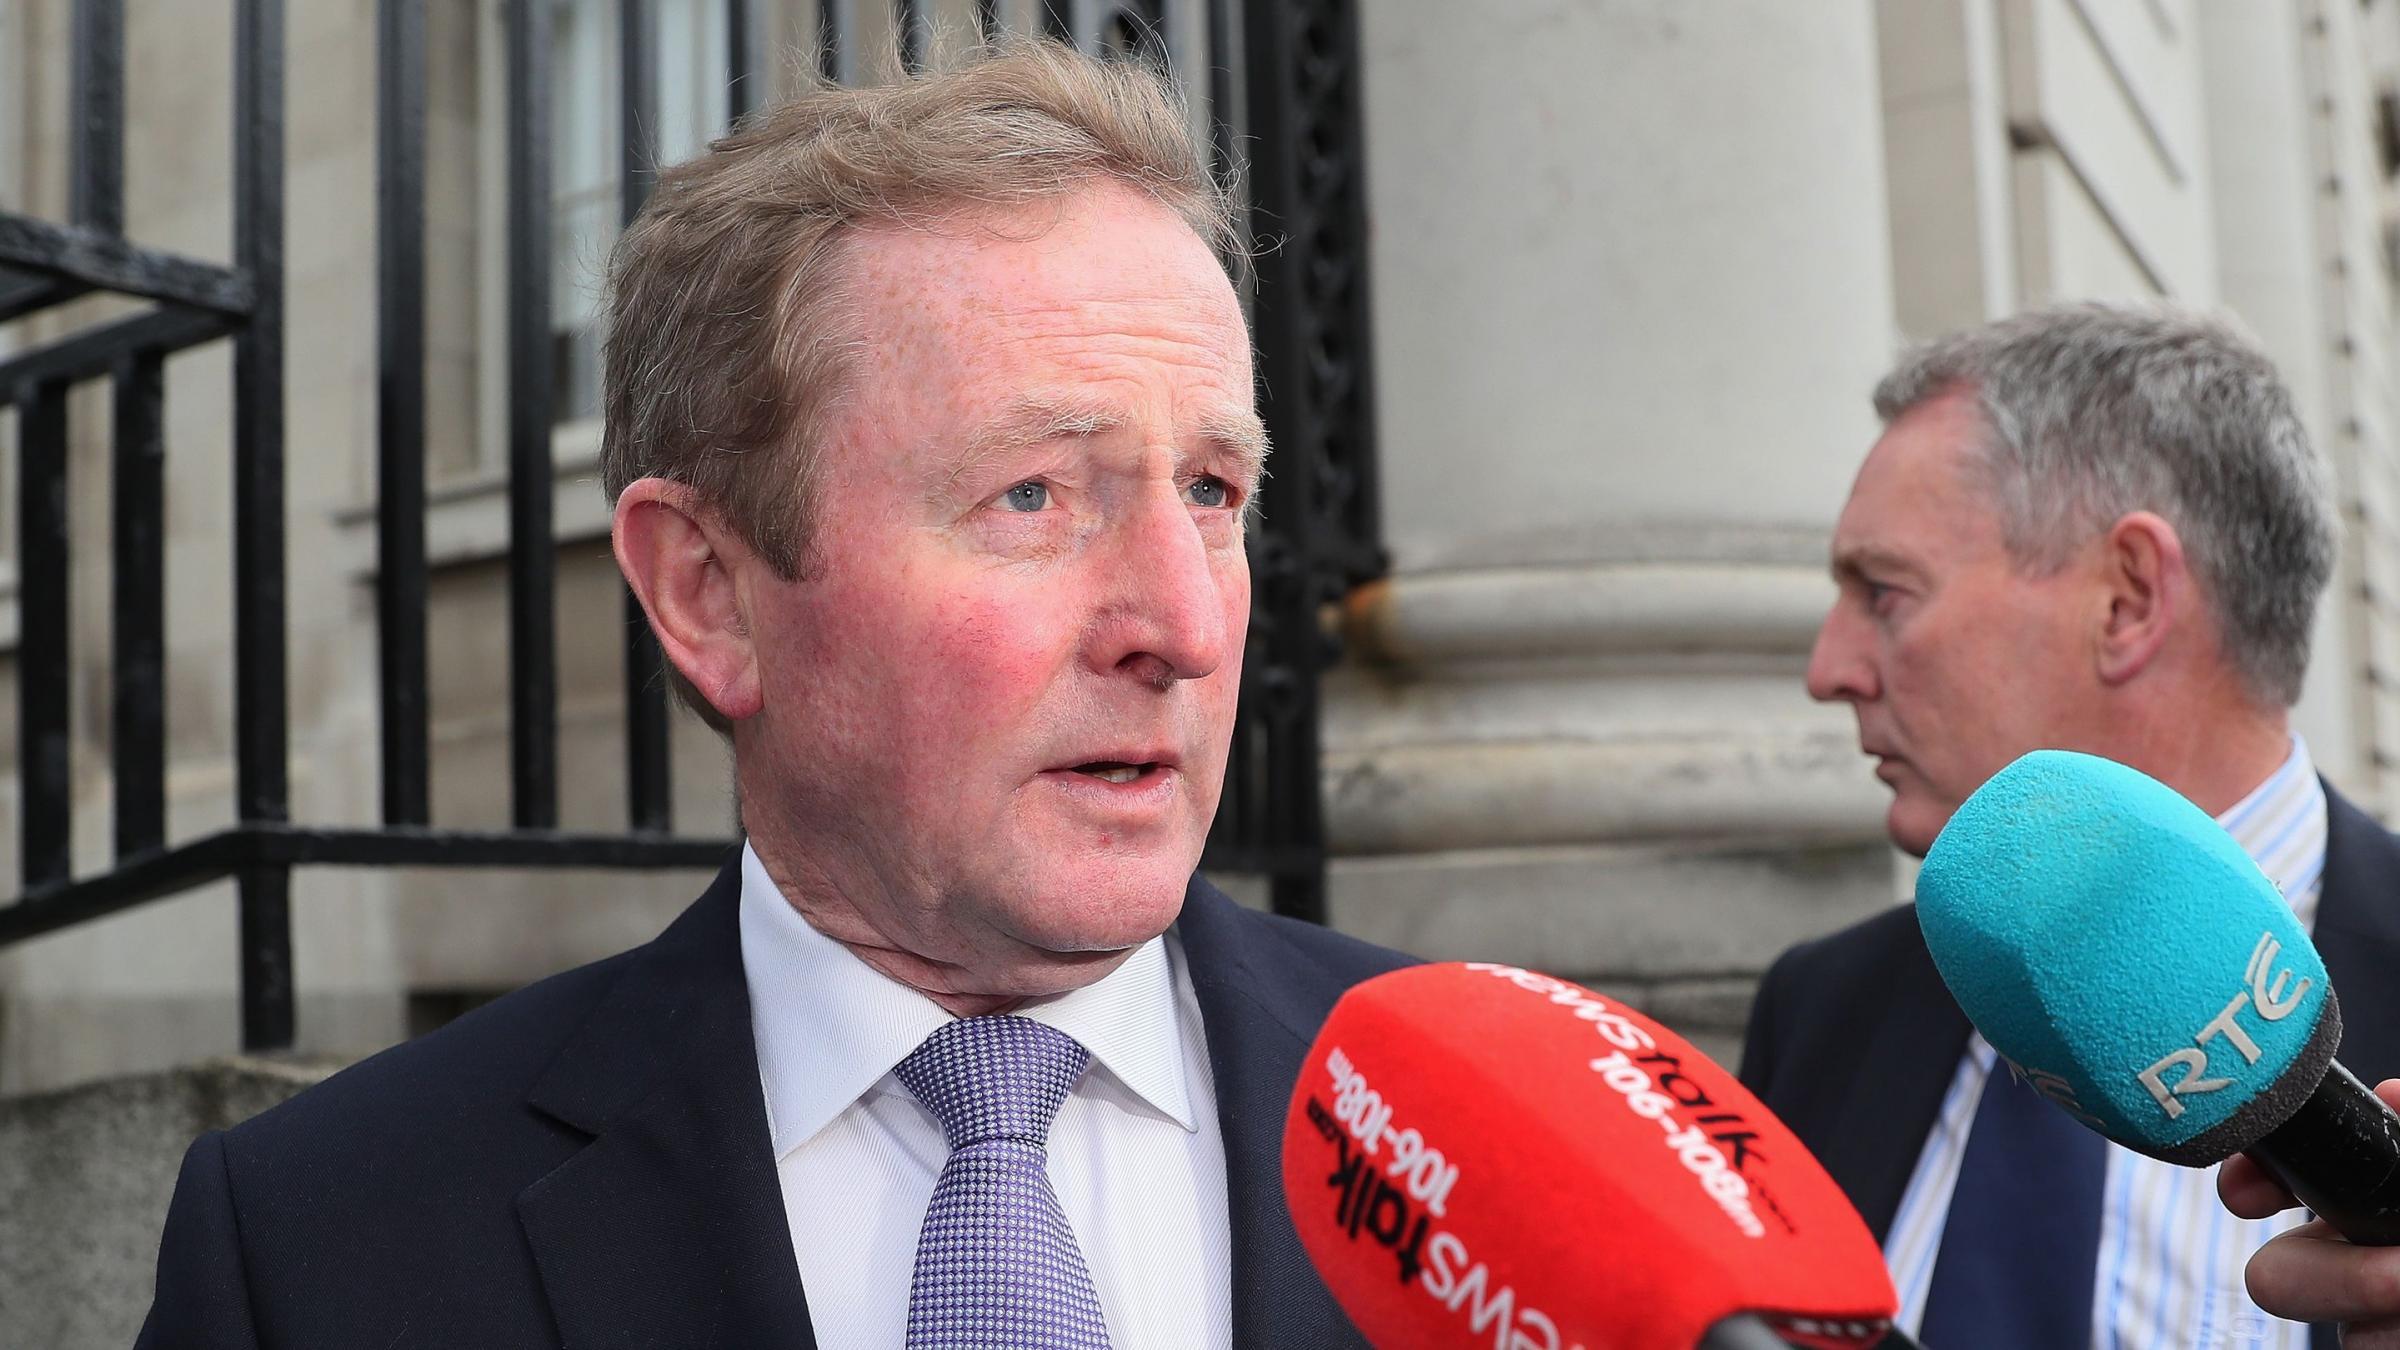 Ireland's Leo Varadkar takes office as new prime minister